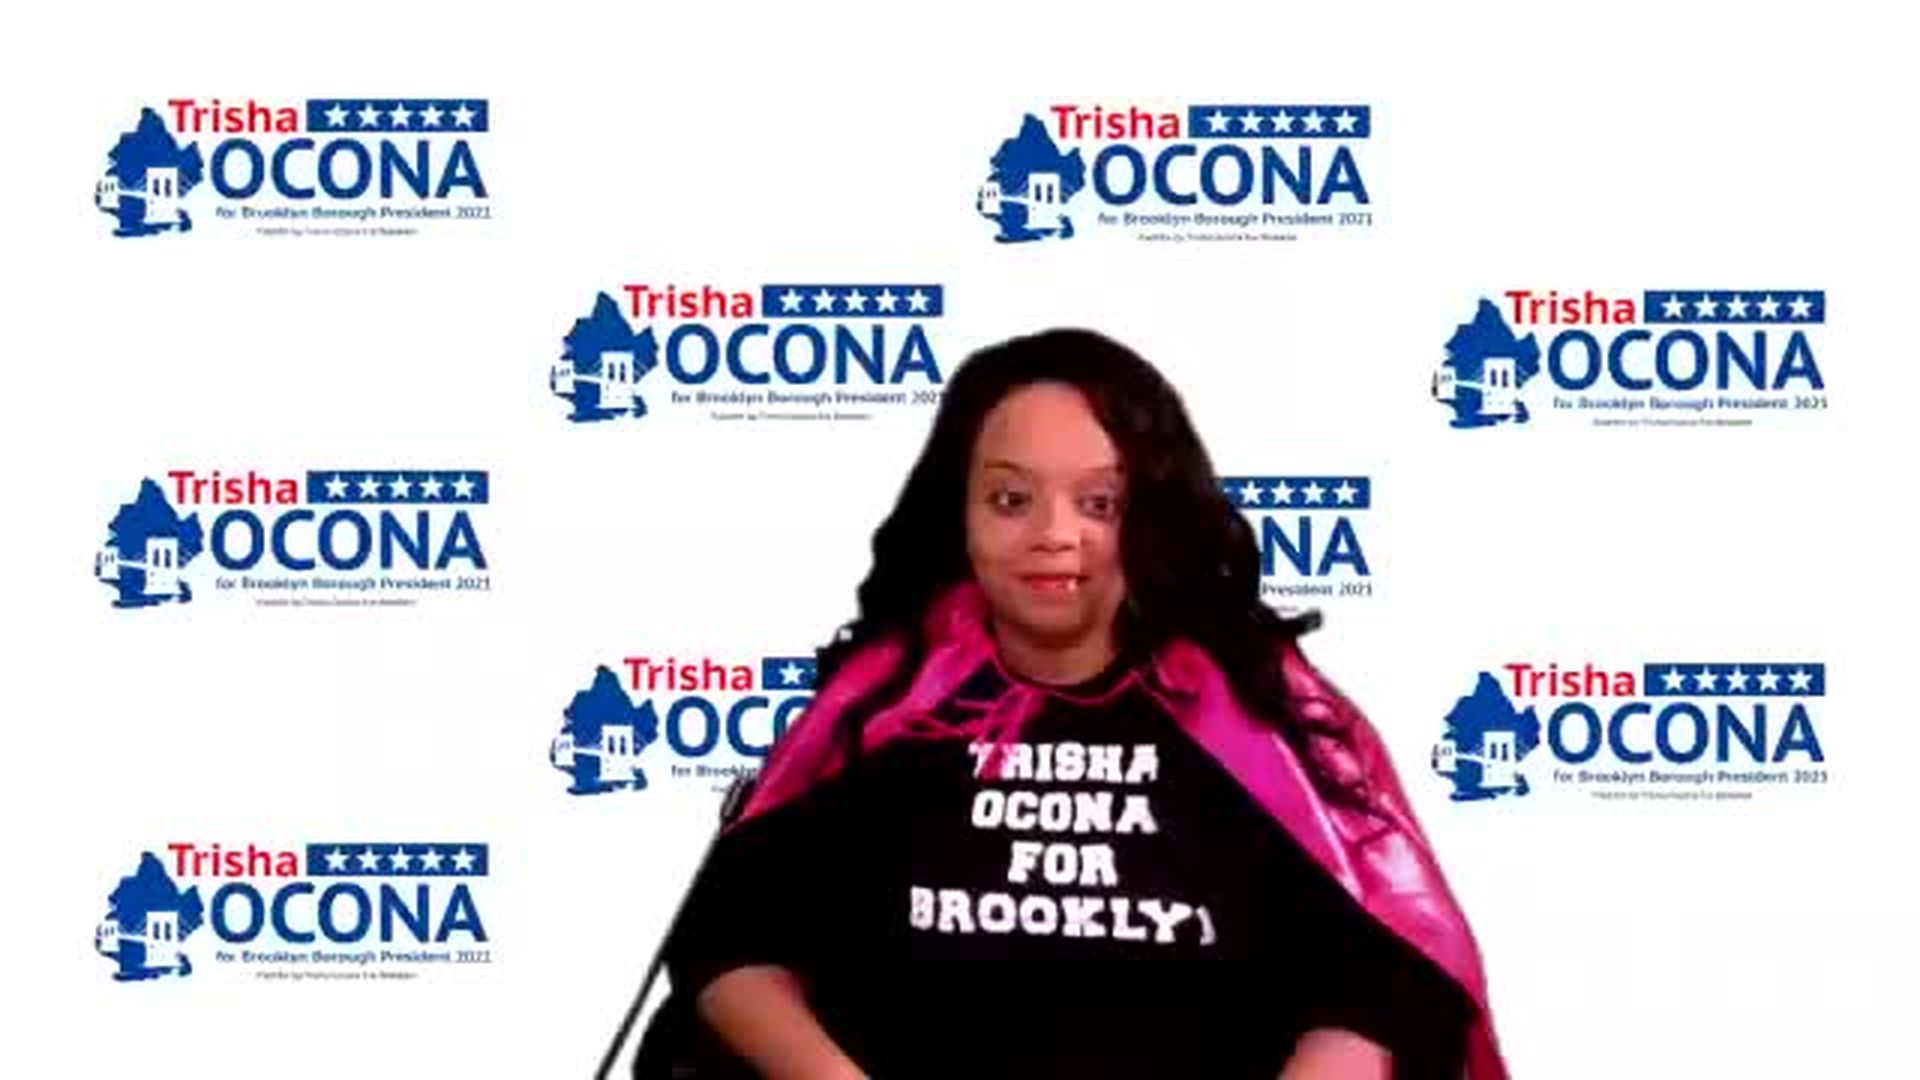 Trisha Ocona | Democratic Candidate for Brooklyn Borough President